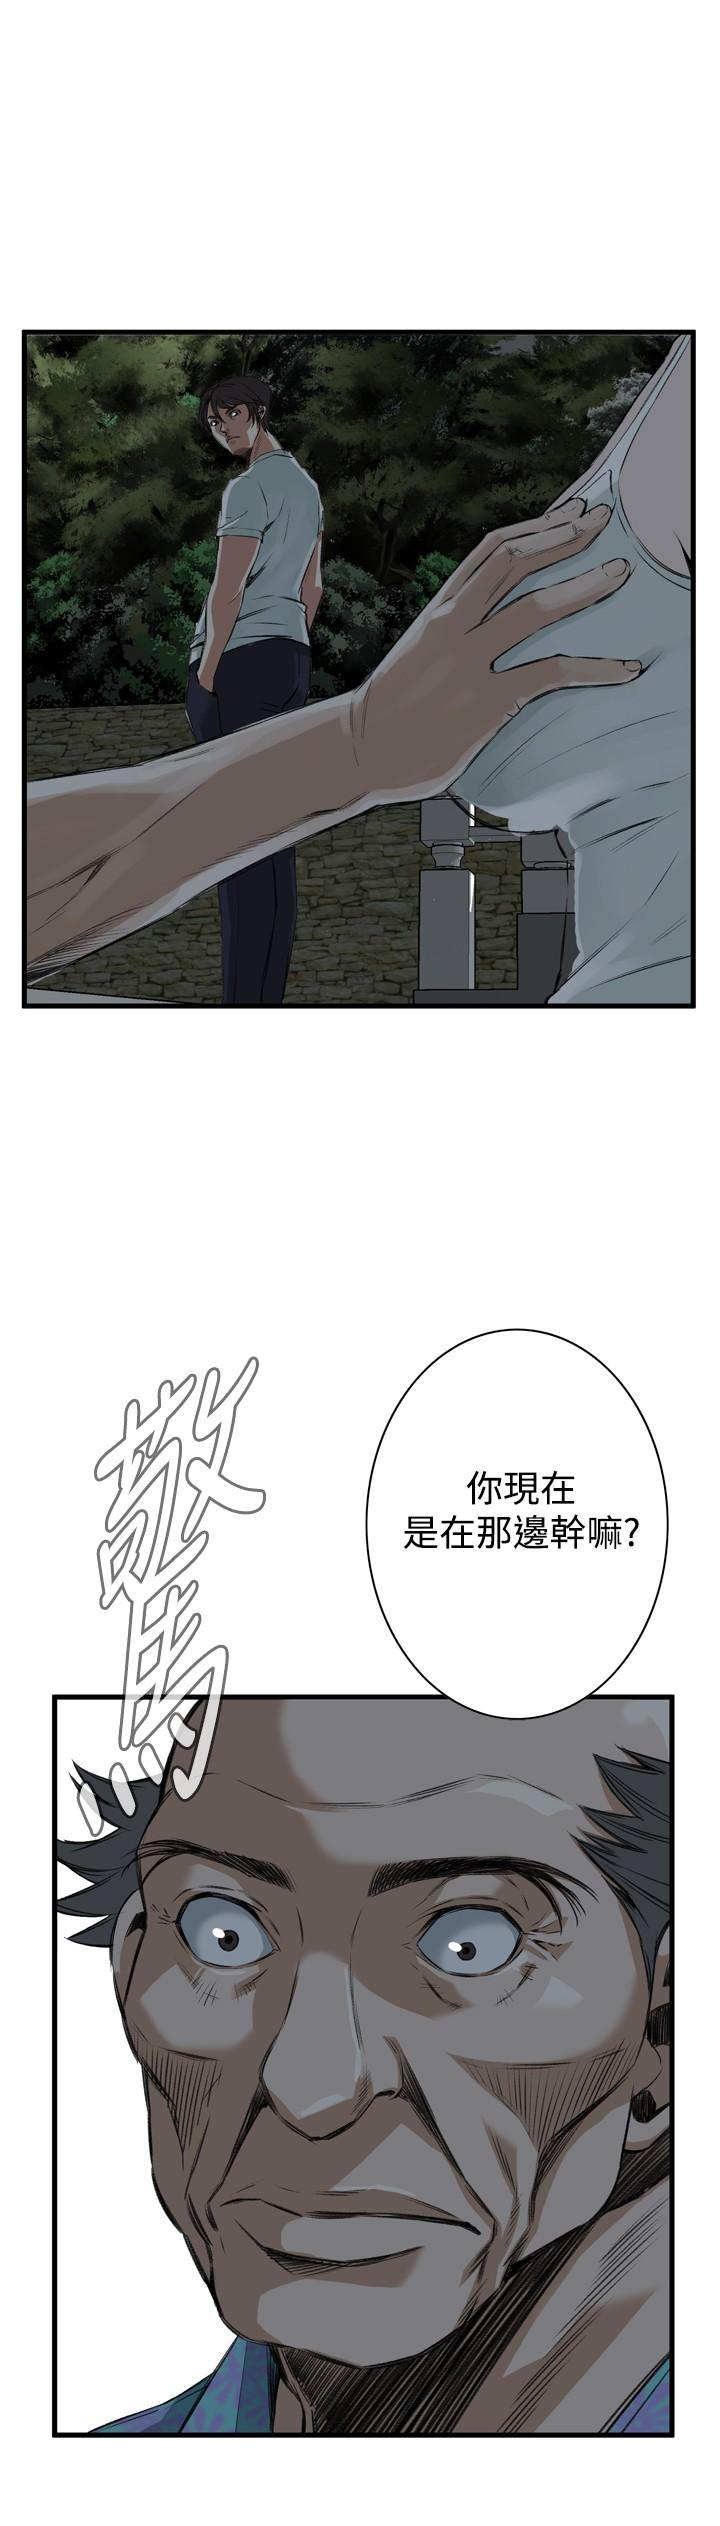 Take a Peek 偷窥 Ch.39~55 [Chinese]中文 204